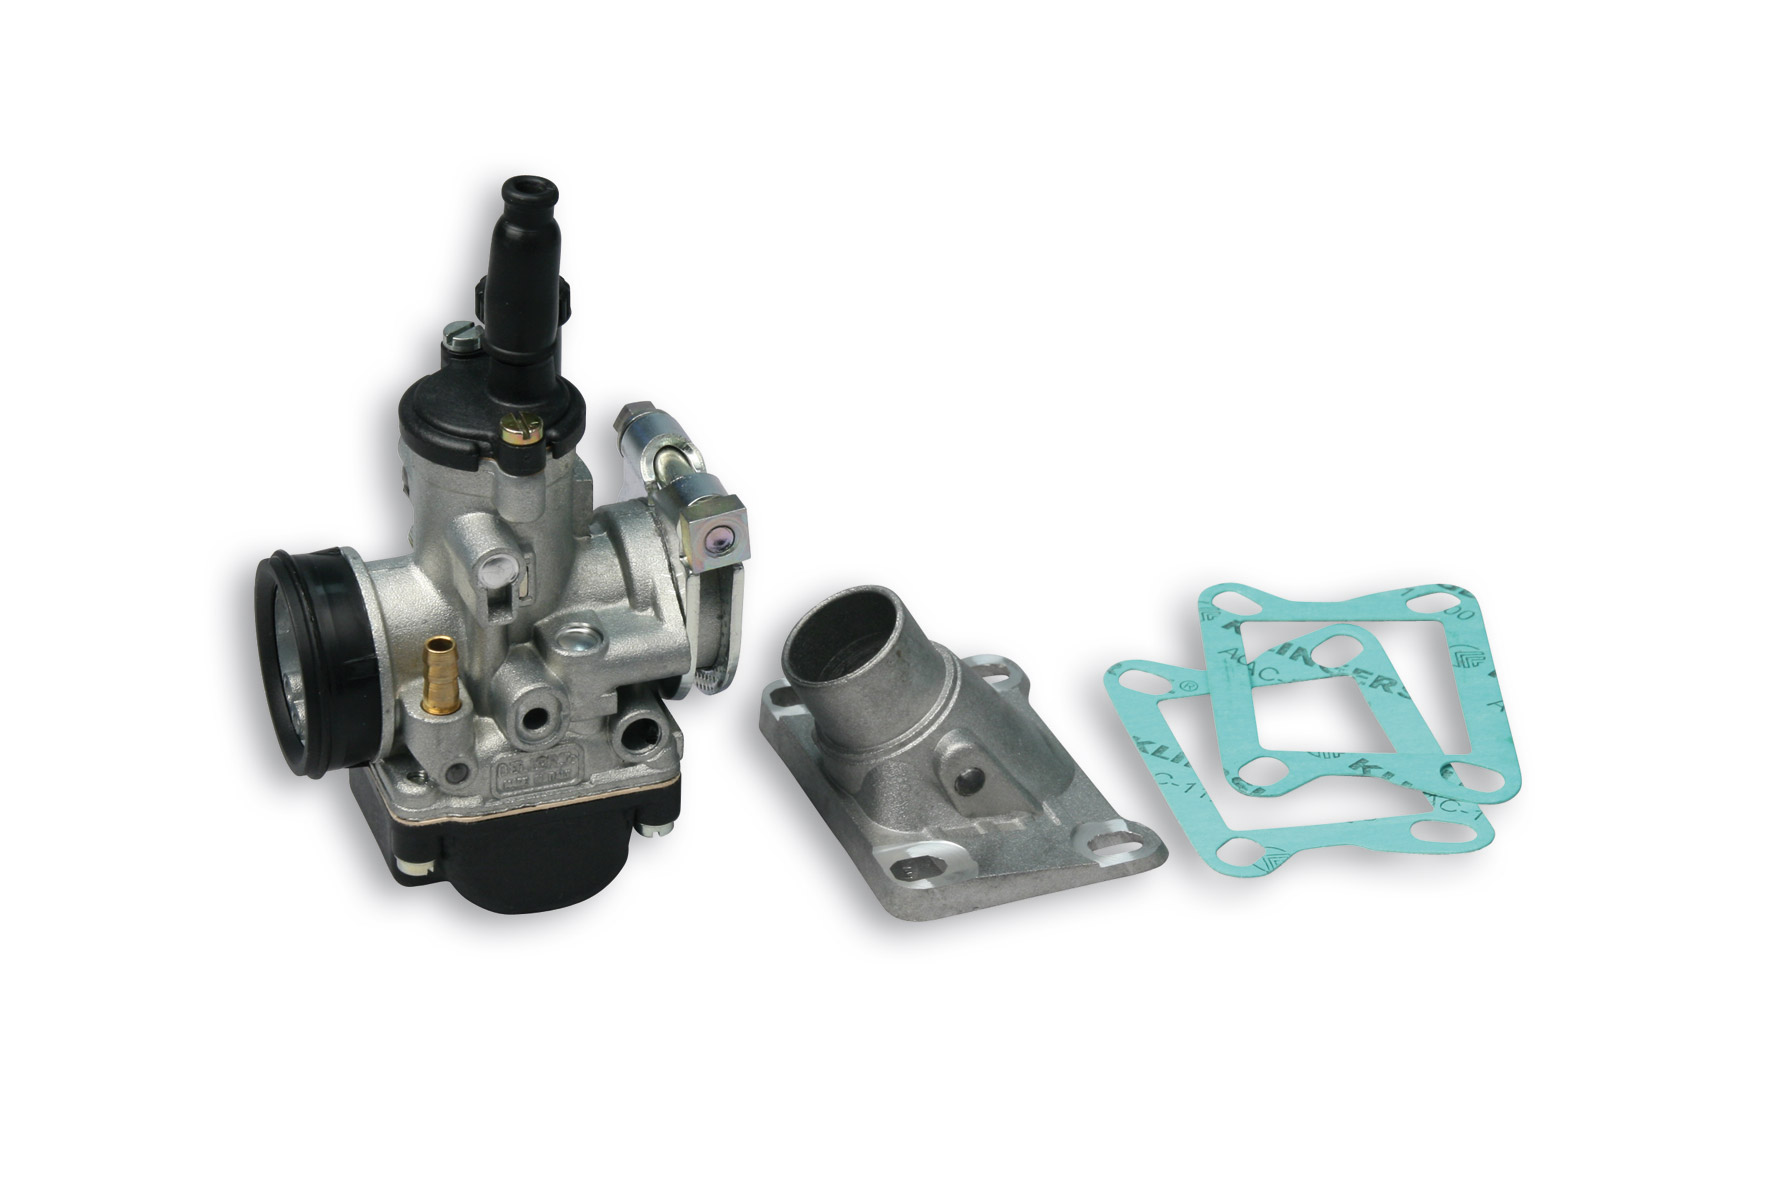 Impianto alimentazione PHBG 21 AS per Honda MB 5 - MT 5 - MTX 5 50cc